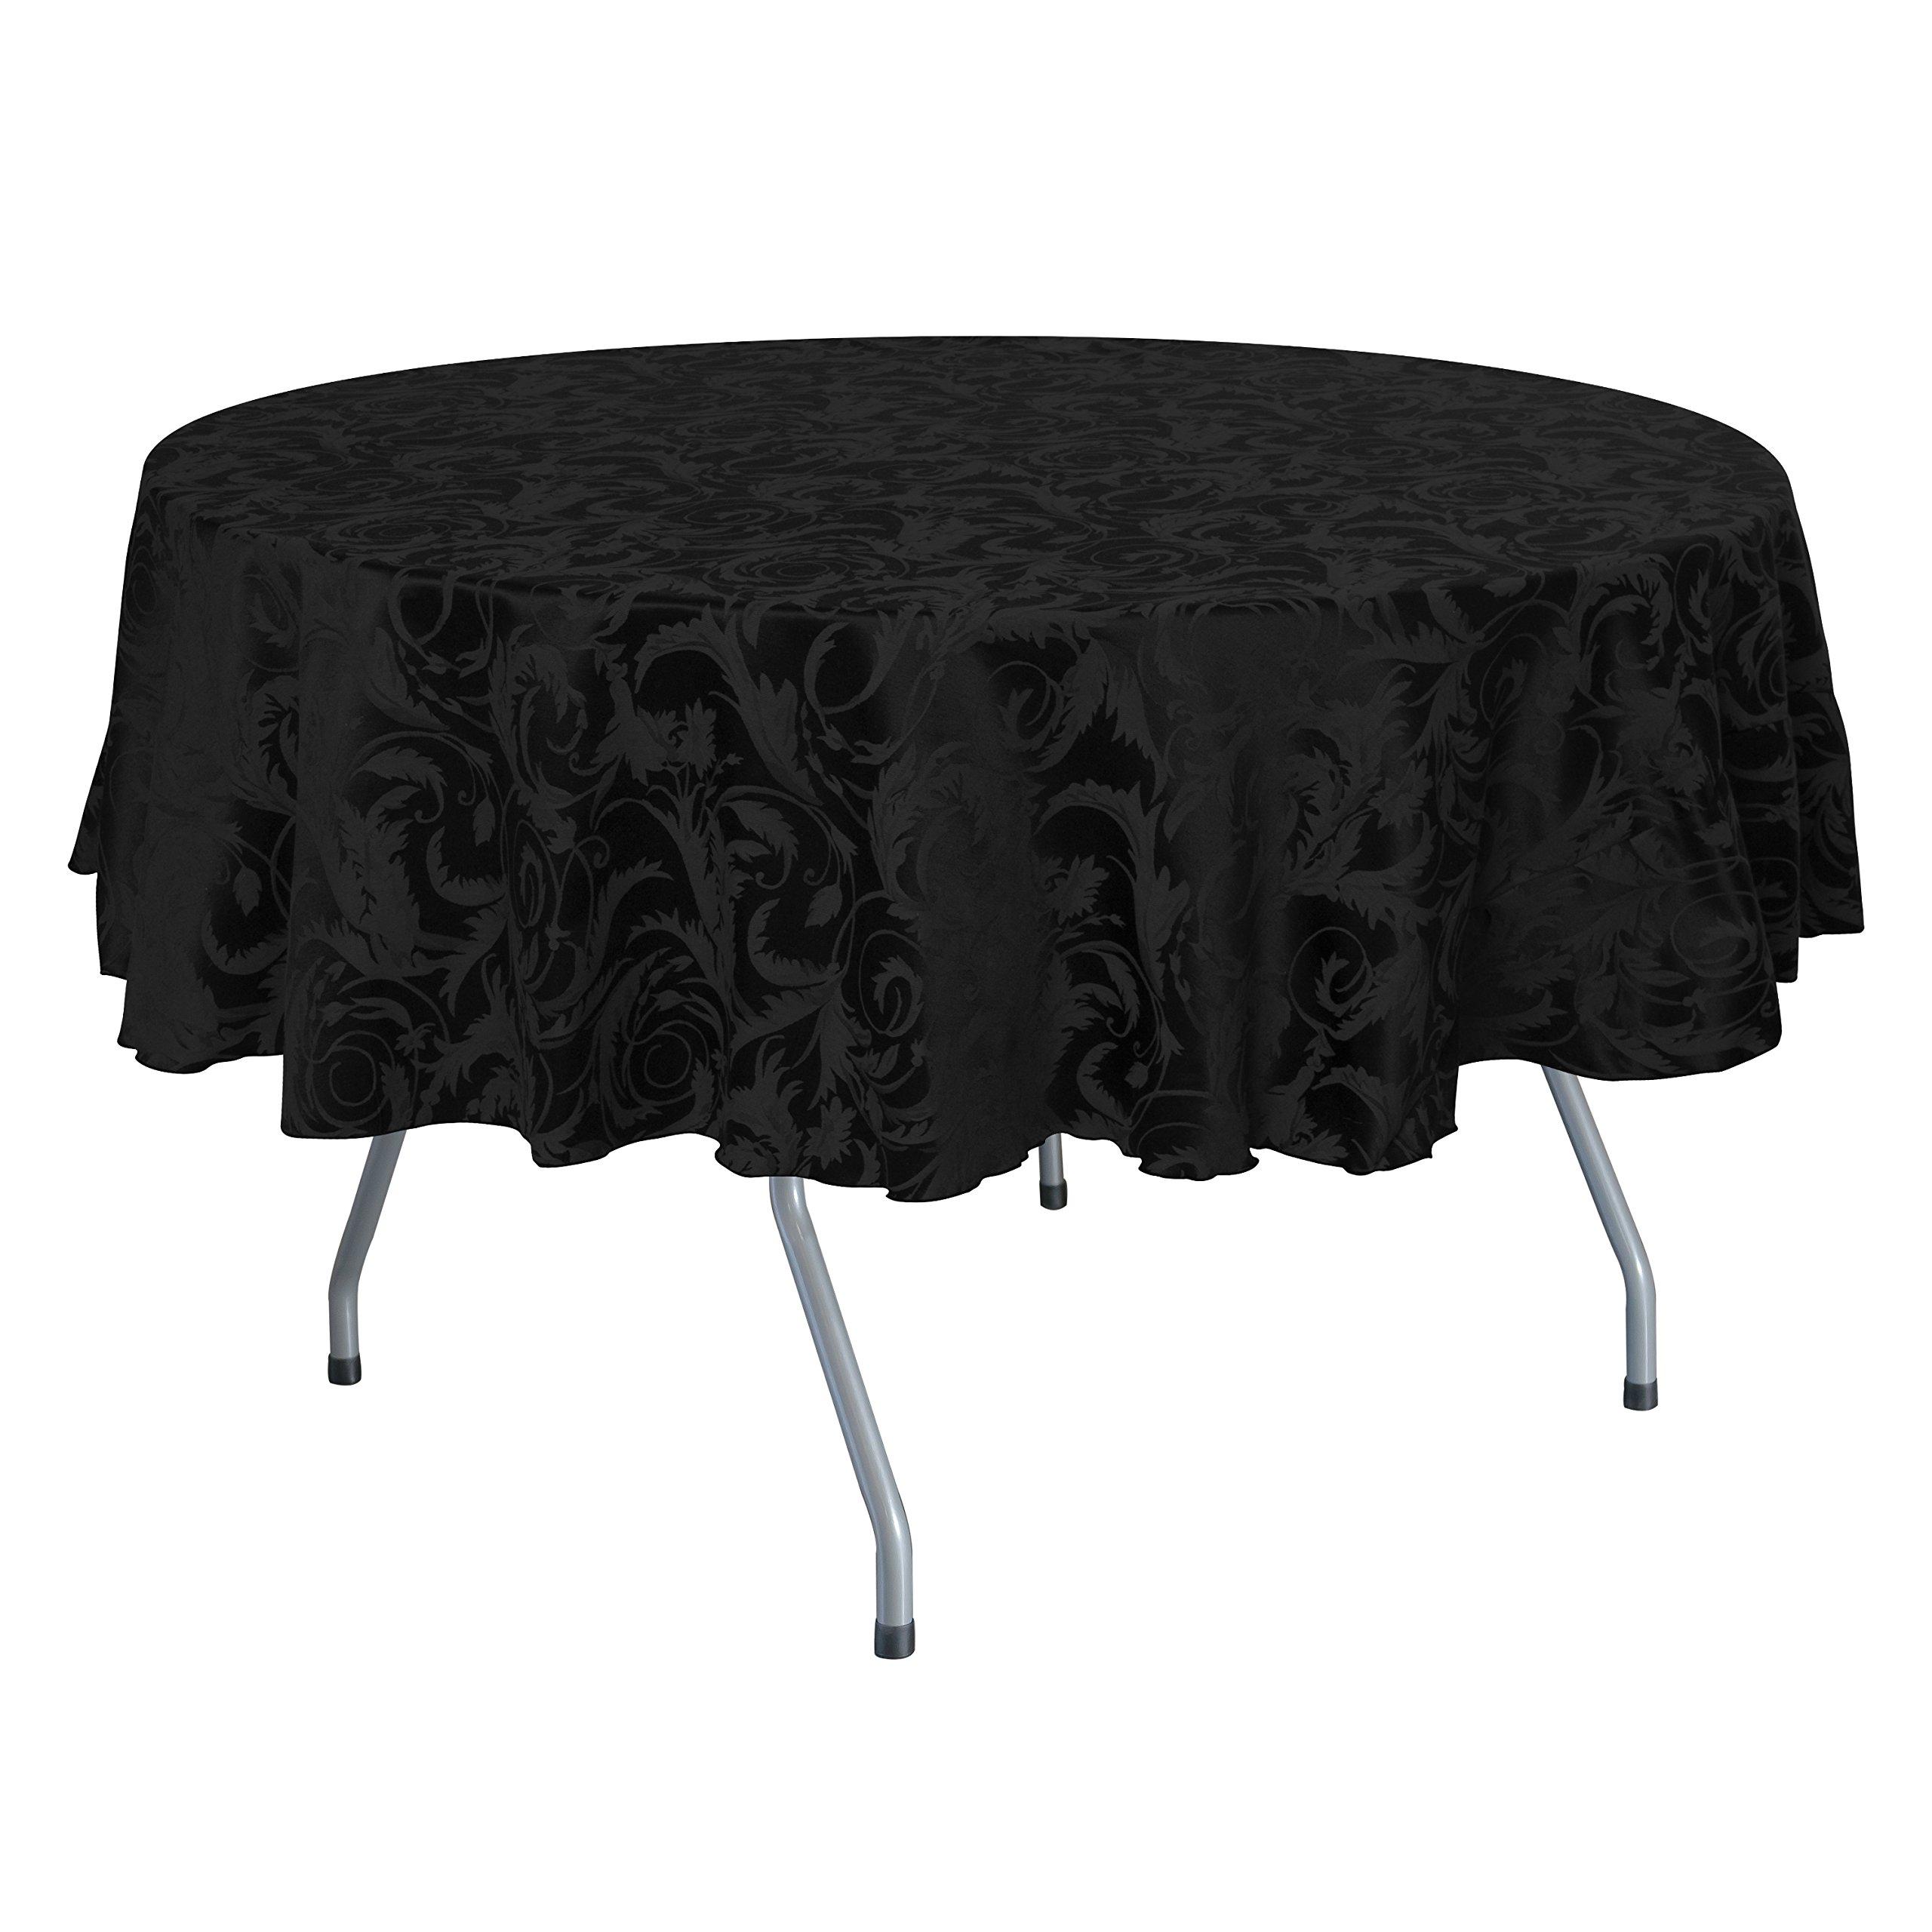 Ultimate Textile (5 Pack) Damask Melrose 60 x 120 Inch Oval Tablecloth - Home Dining Collection - Floral Leaf Scroll Jacquard Design, Black